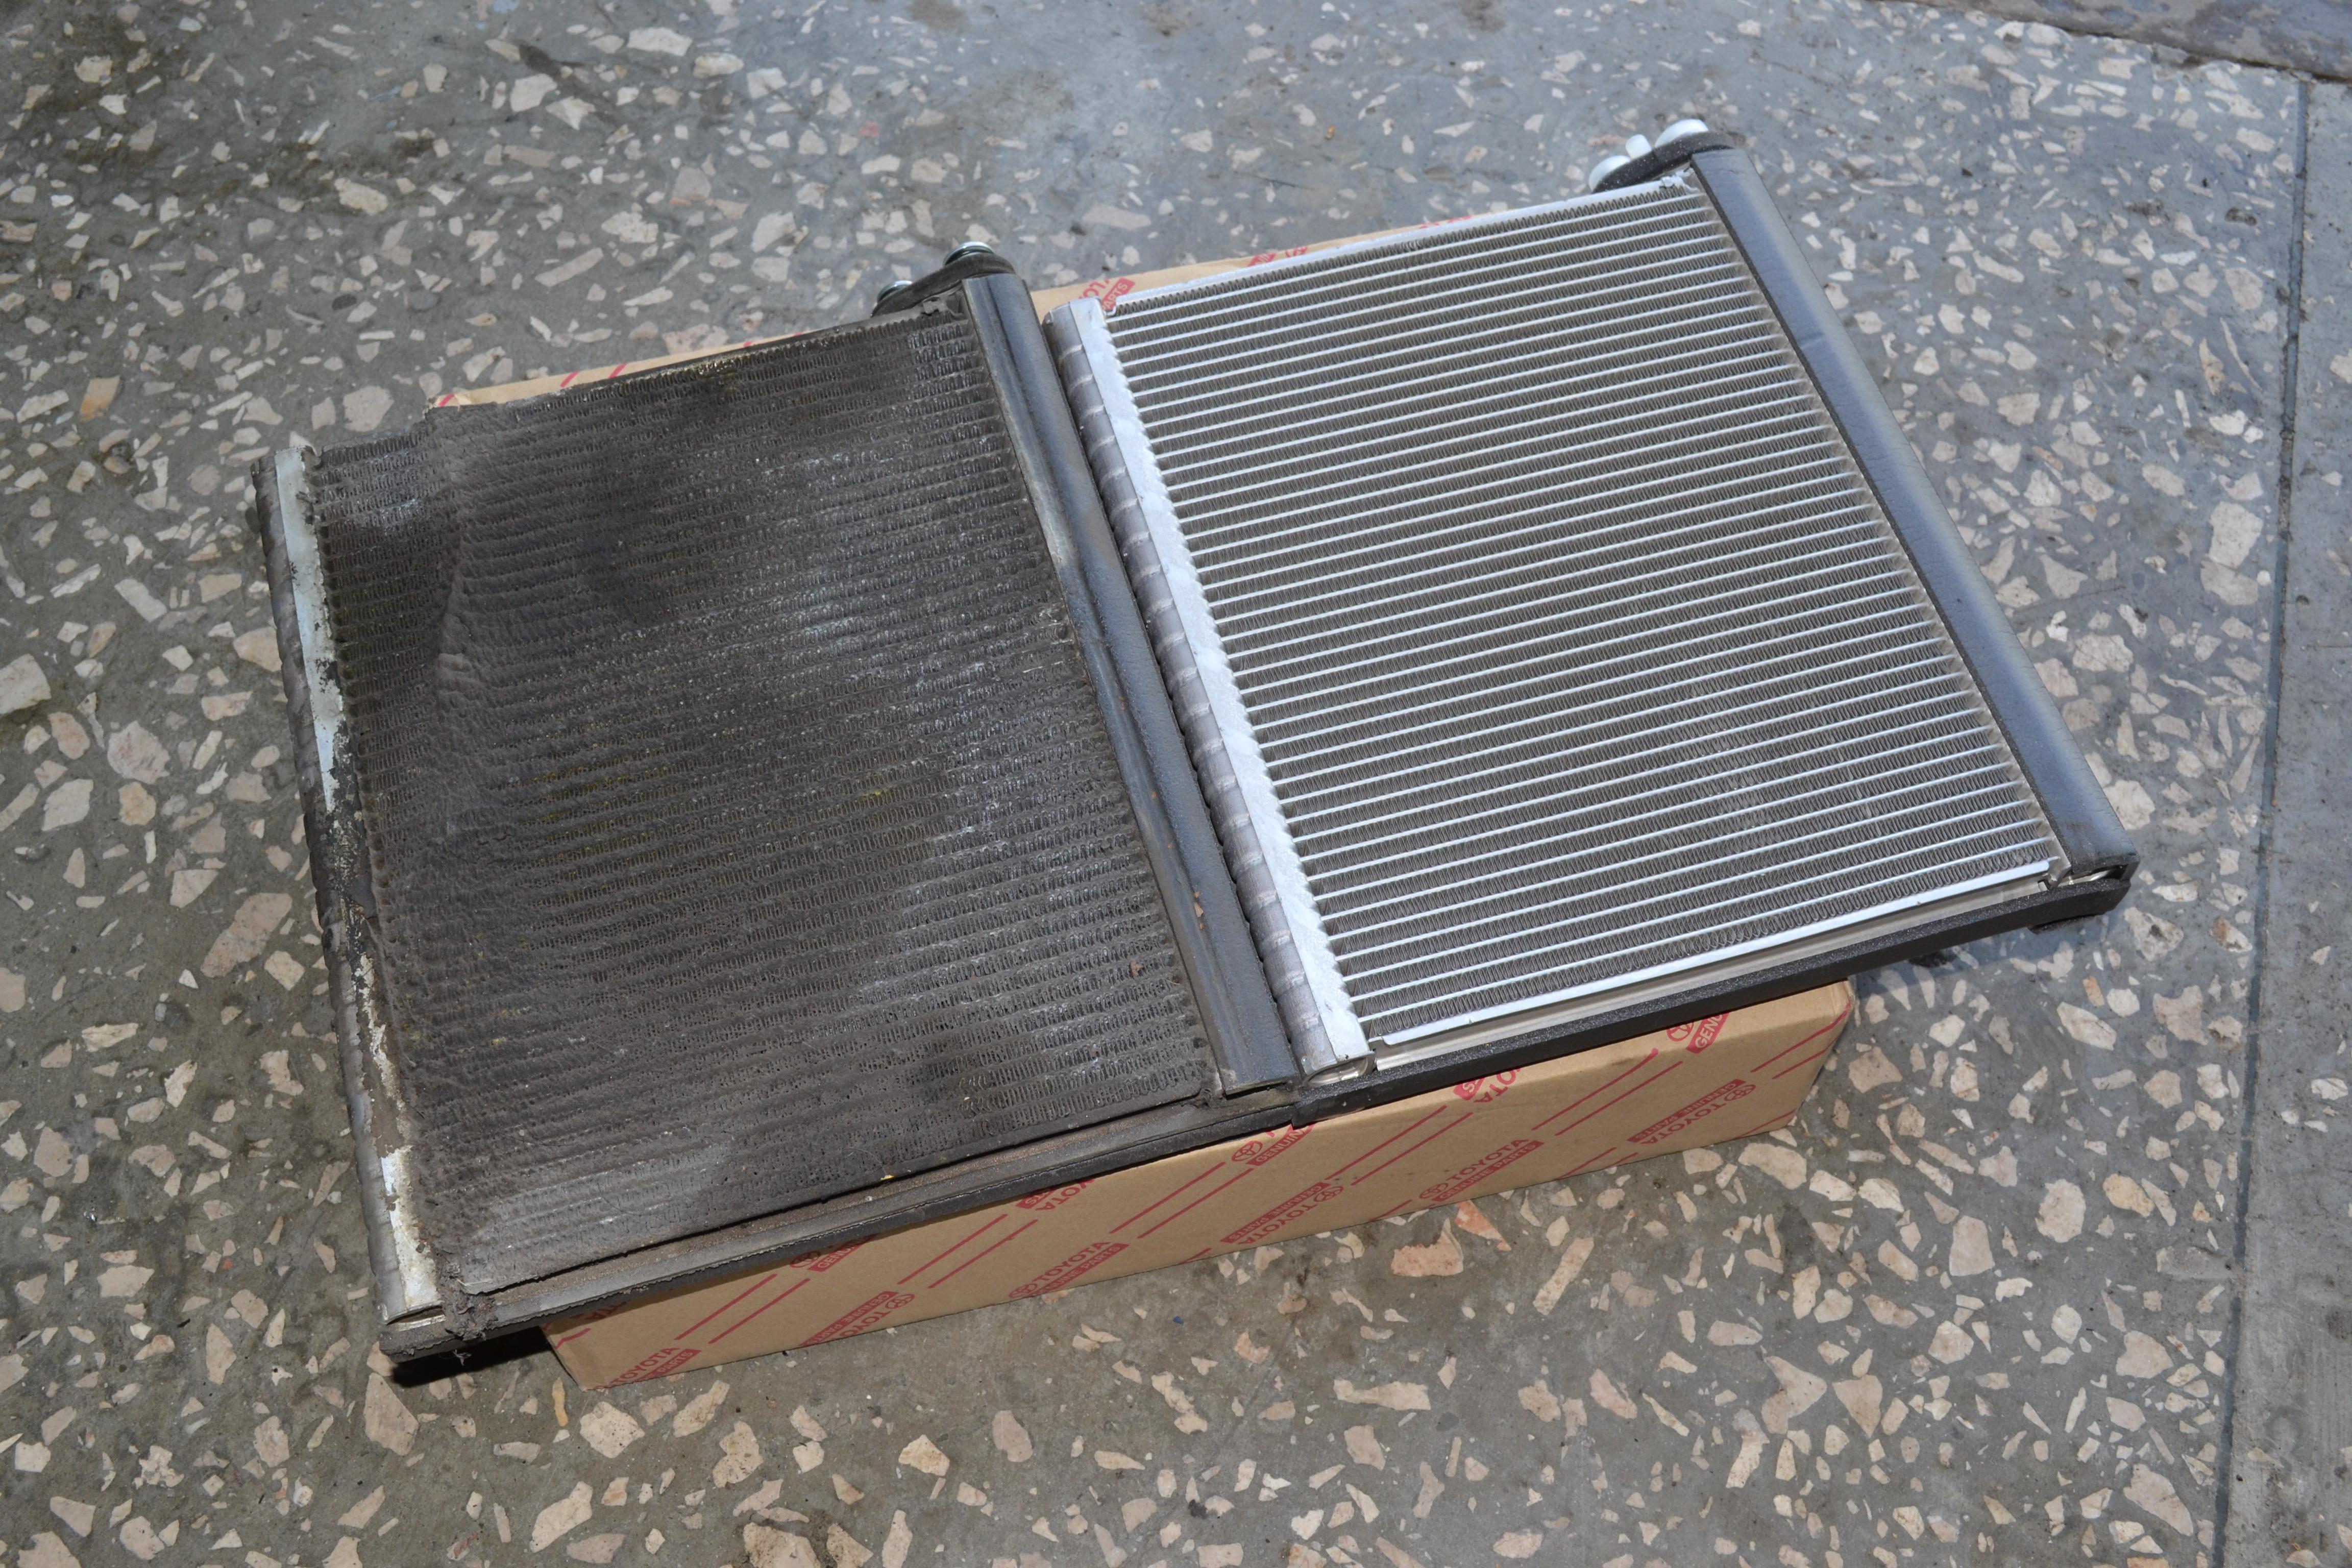 Коррозия испарителя кондиционера автомобиля